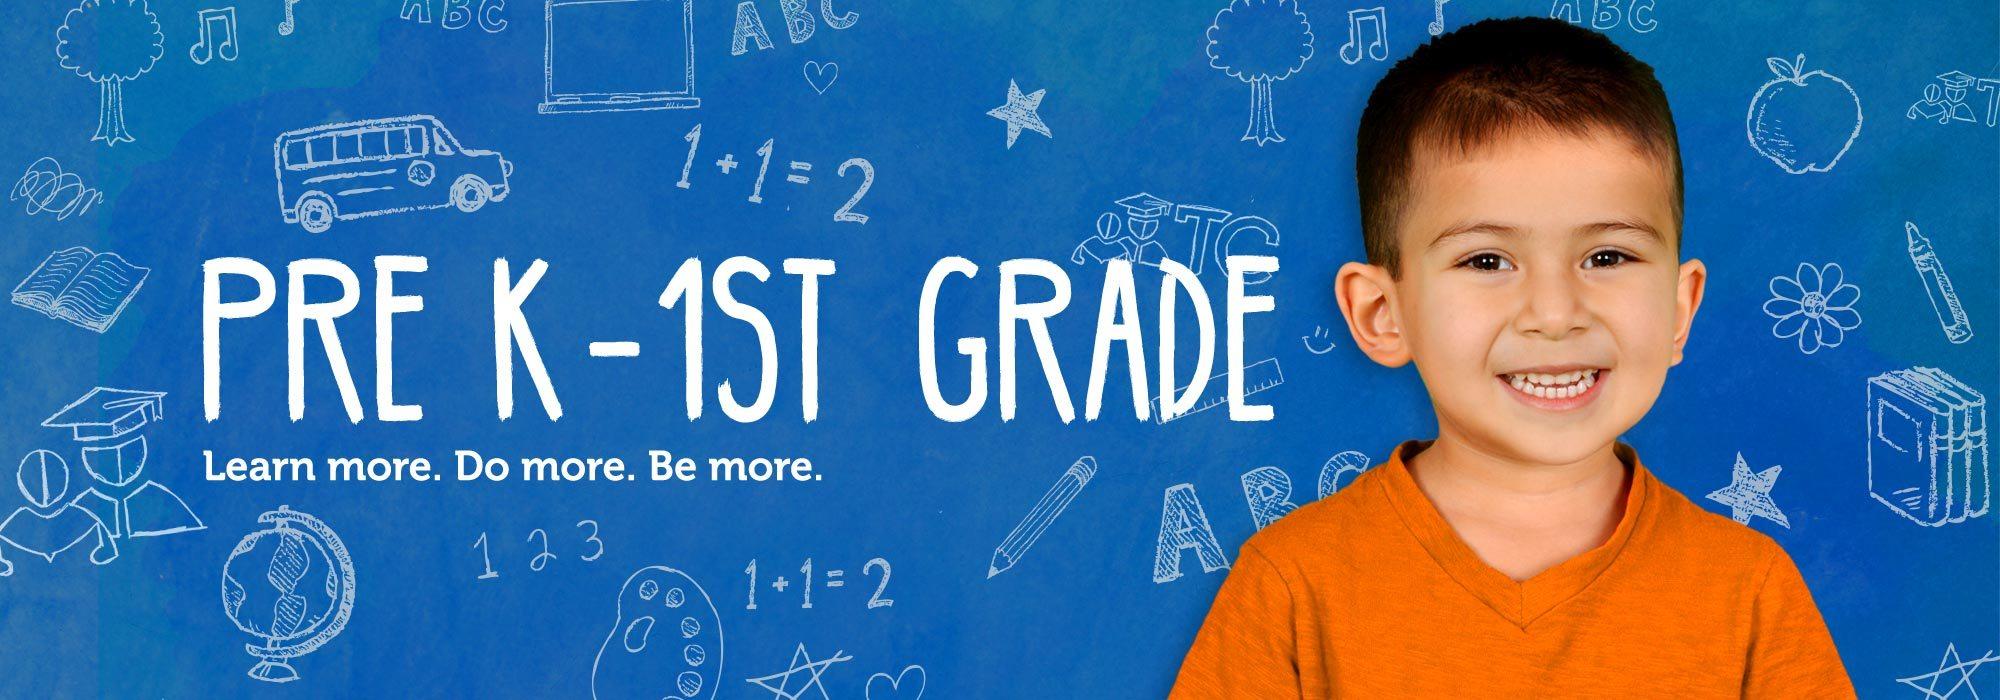 tutoring-club-pre-k-1st-grade